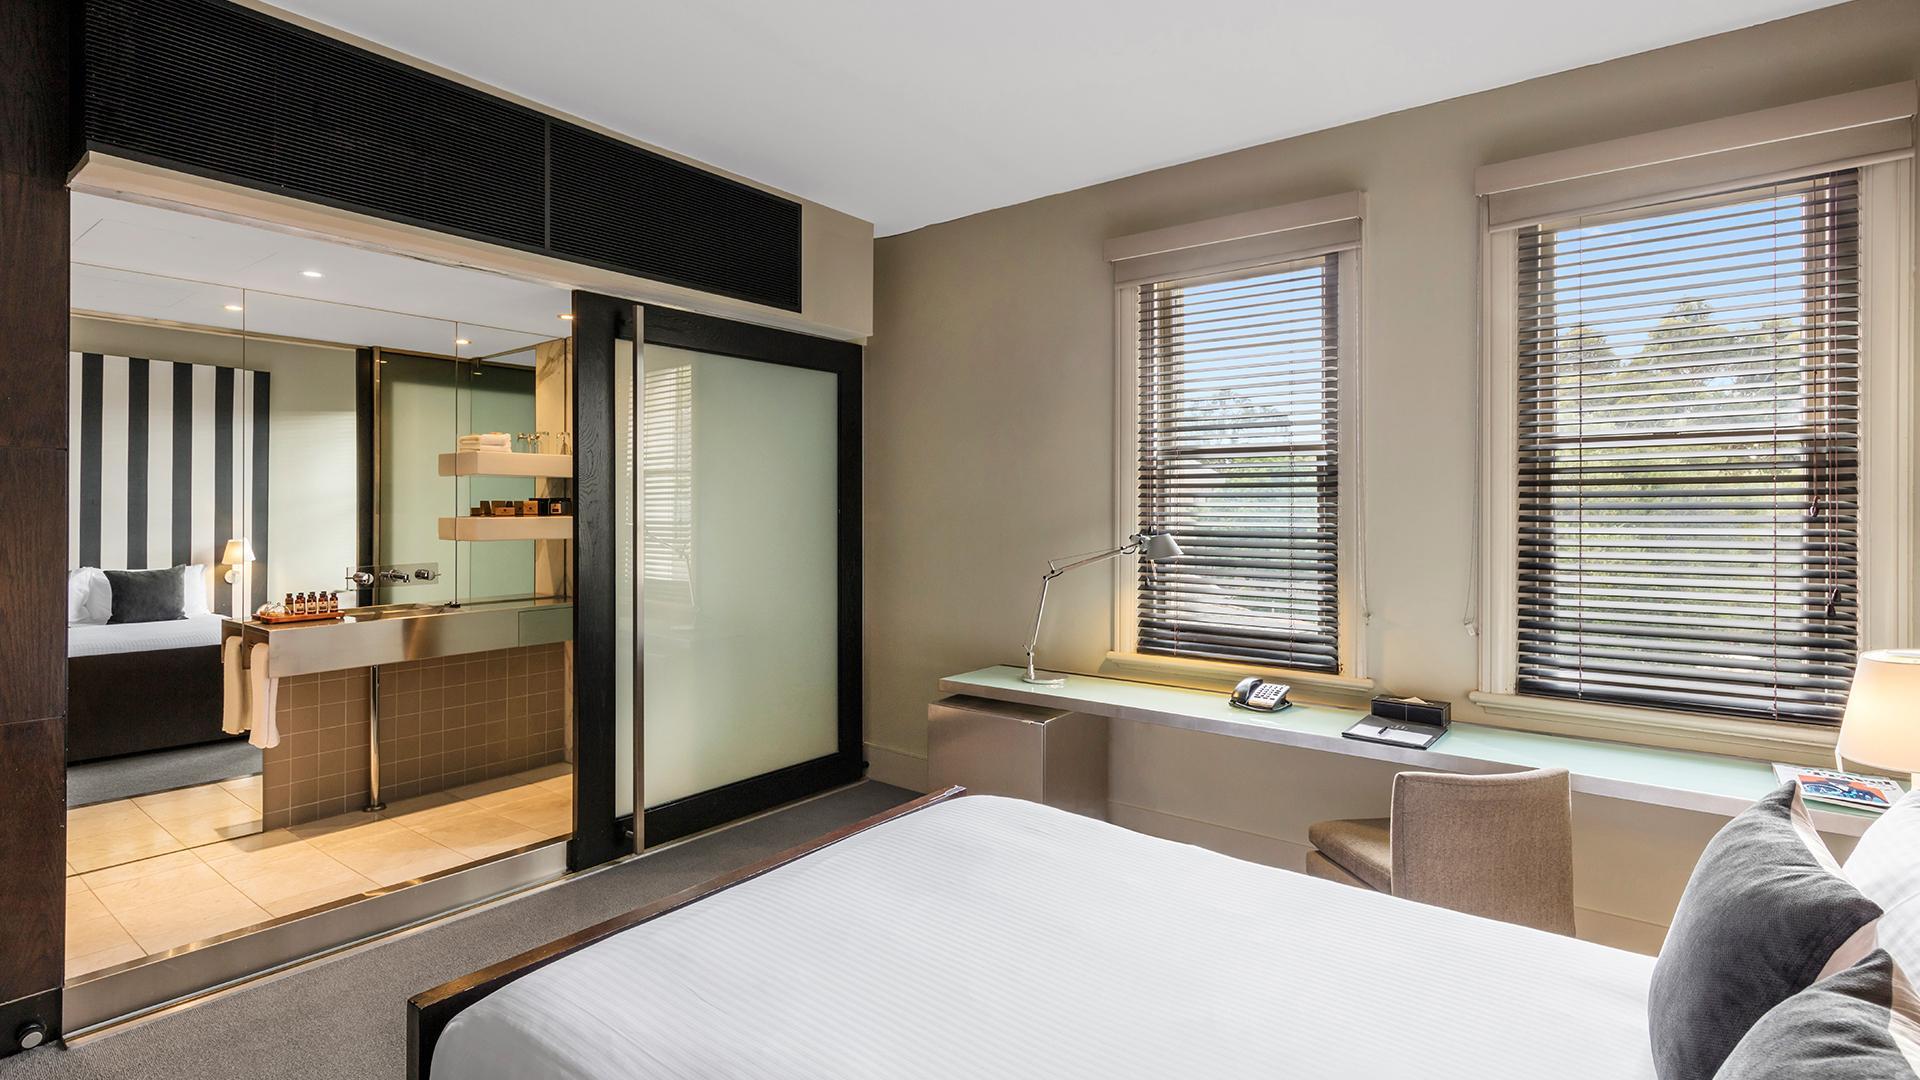 Heritage Room image 1 at Lancemore Mansion Hotel Werribee Park by City of Wyndham, Victoria, Australia